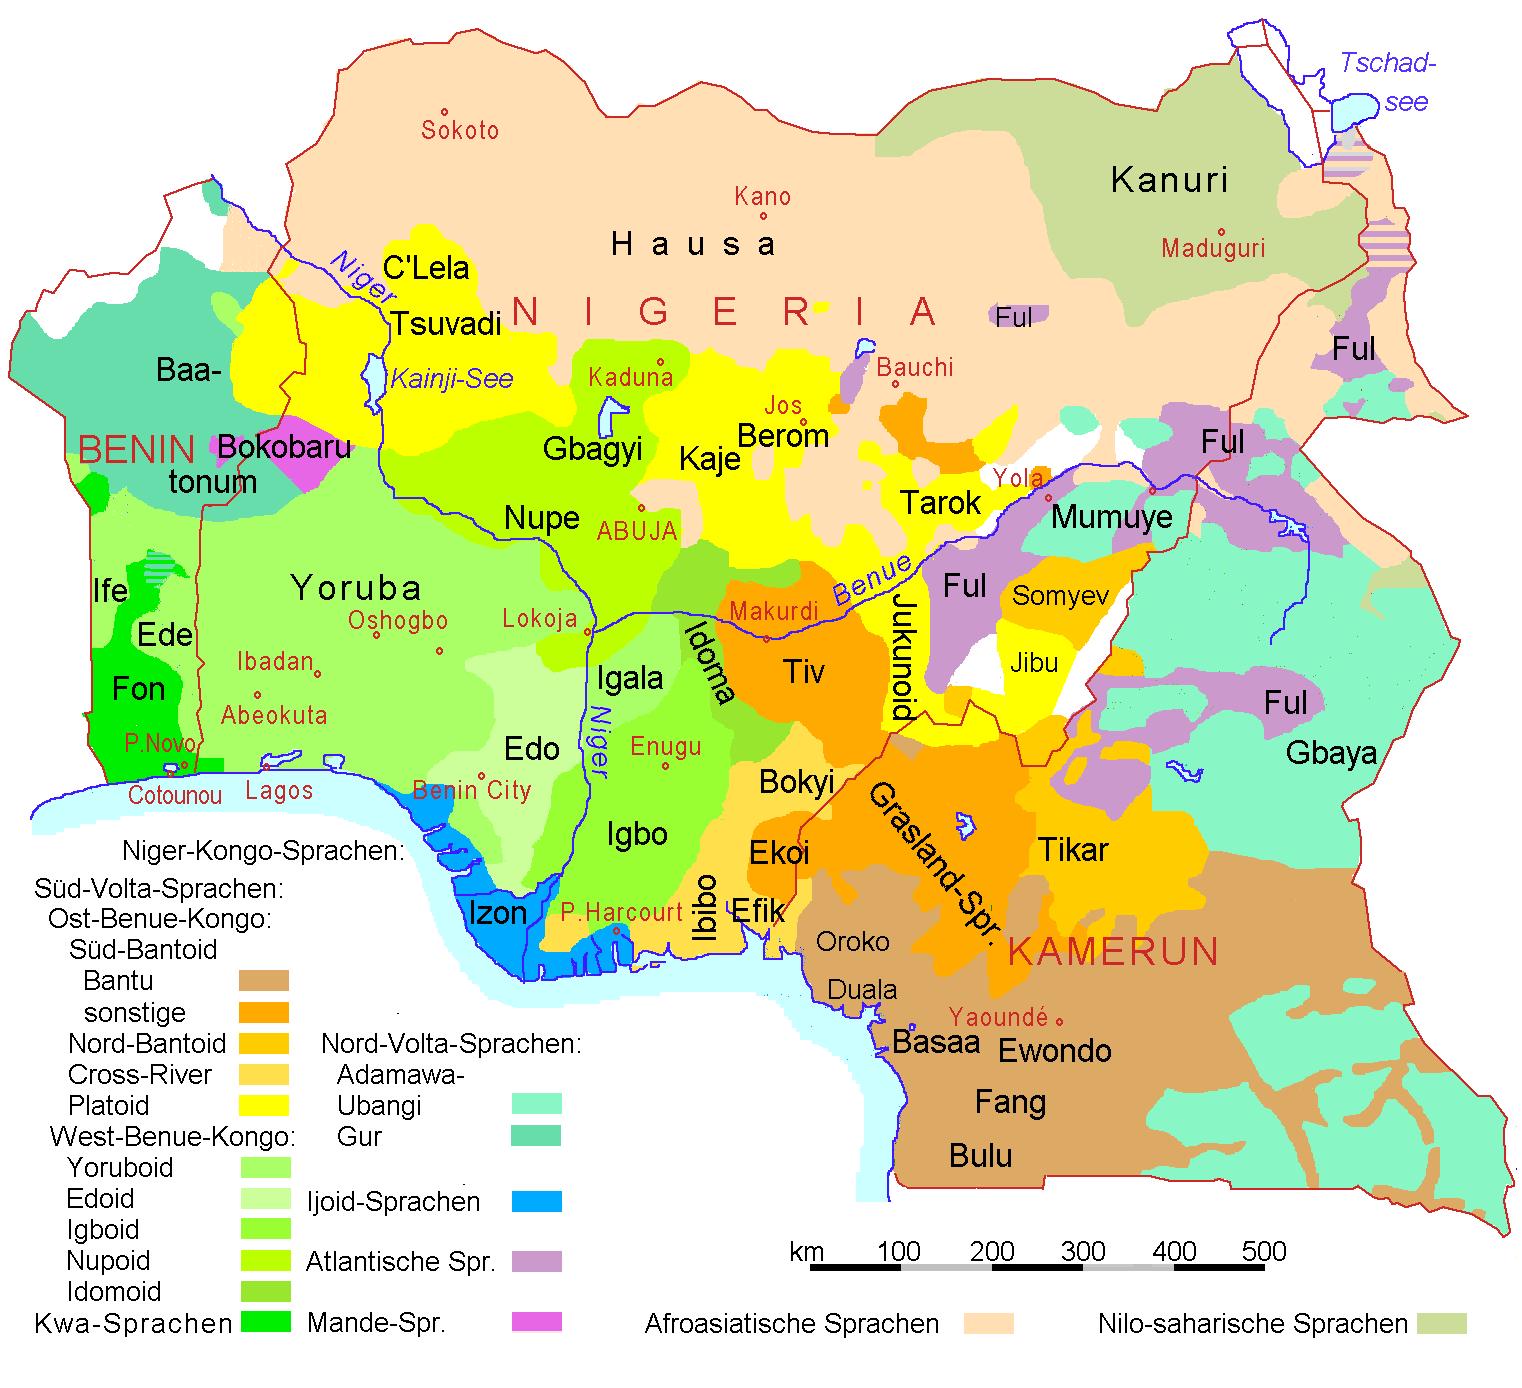 FileNigeria Benin Kamerun Sprachenpng Wikimedia Commons - Niger map hd pdf